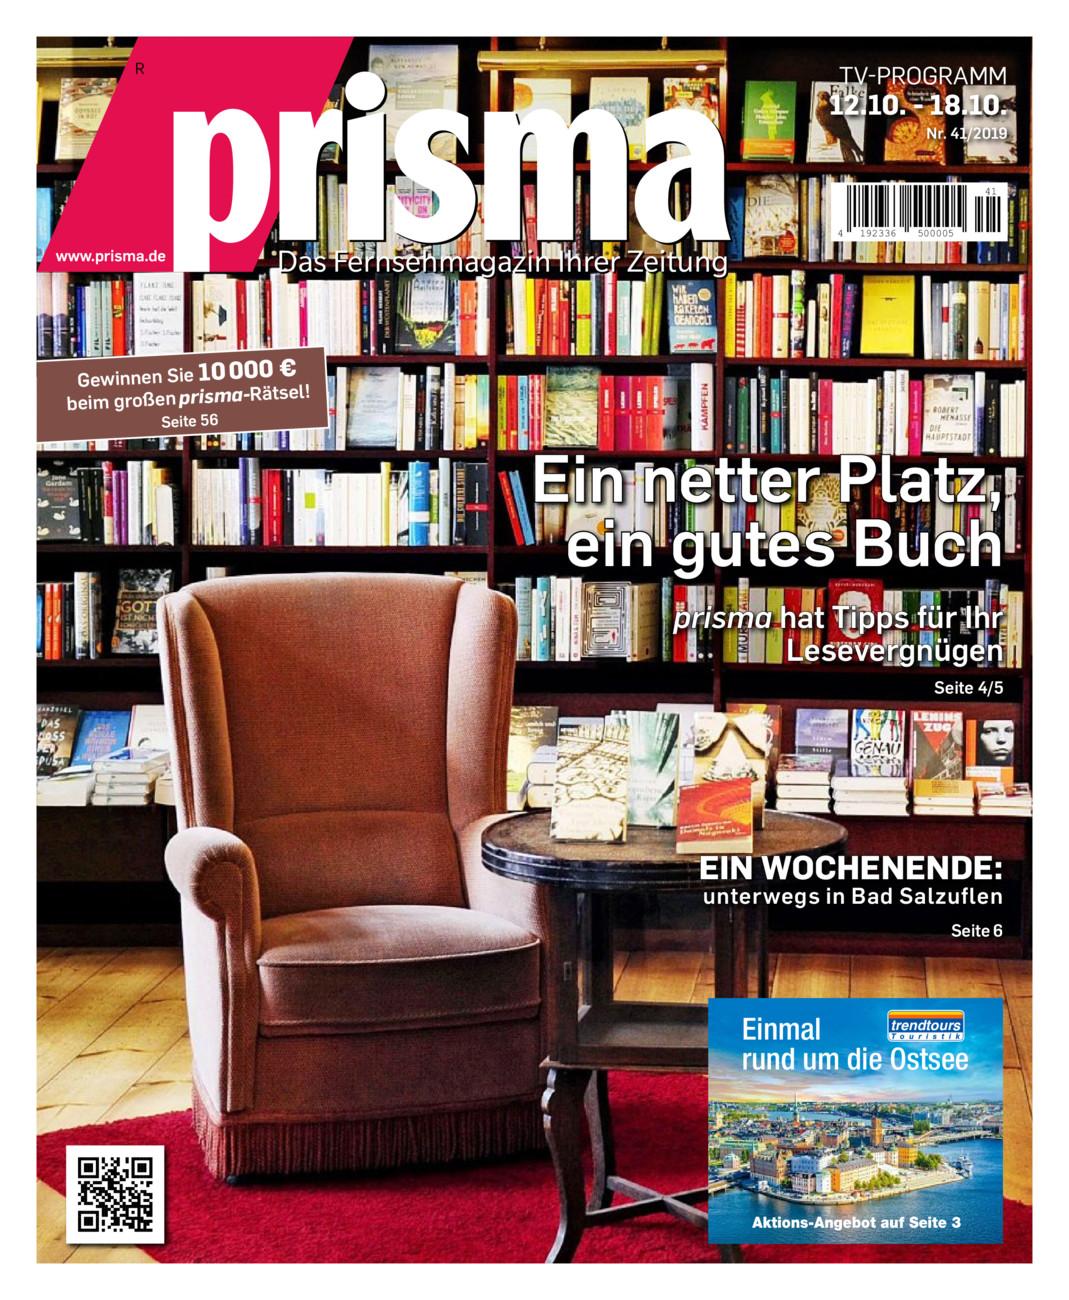 Prisma 12.10. - 18.10.